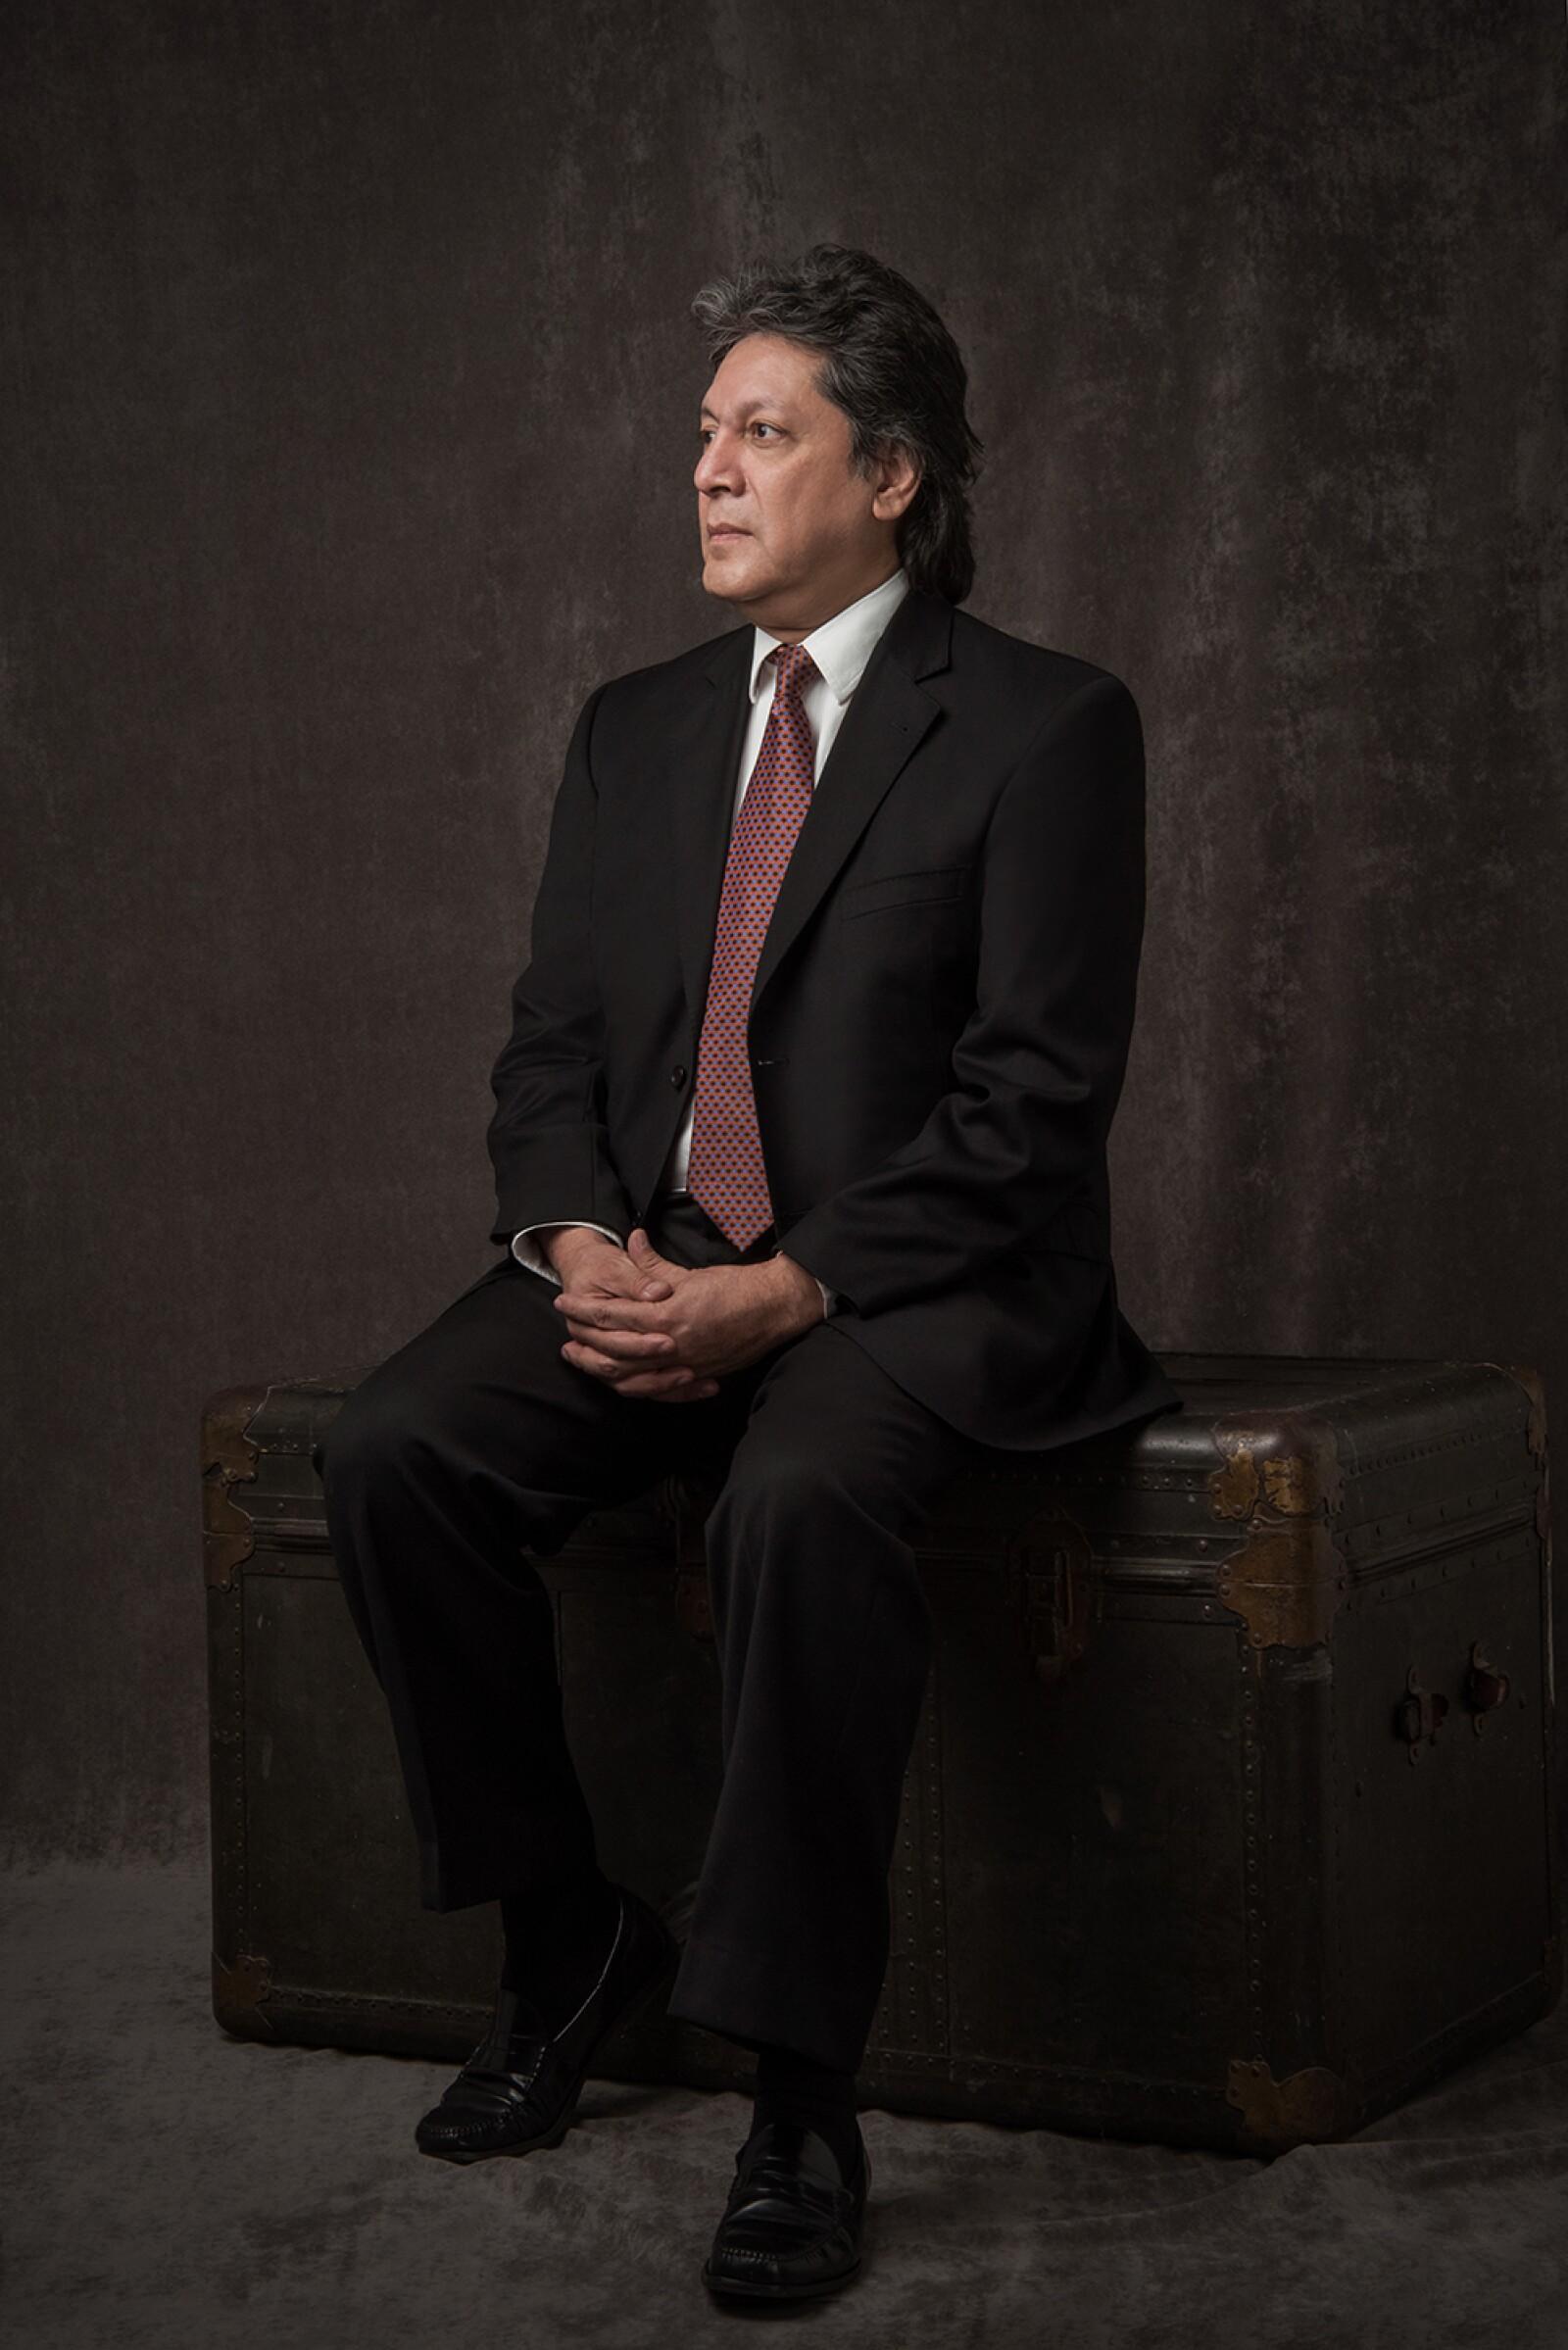 Dr Salvador Mercado Beristain